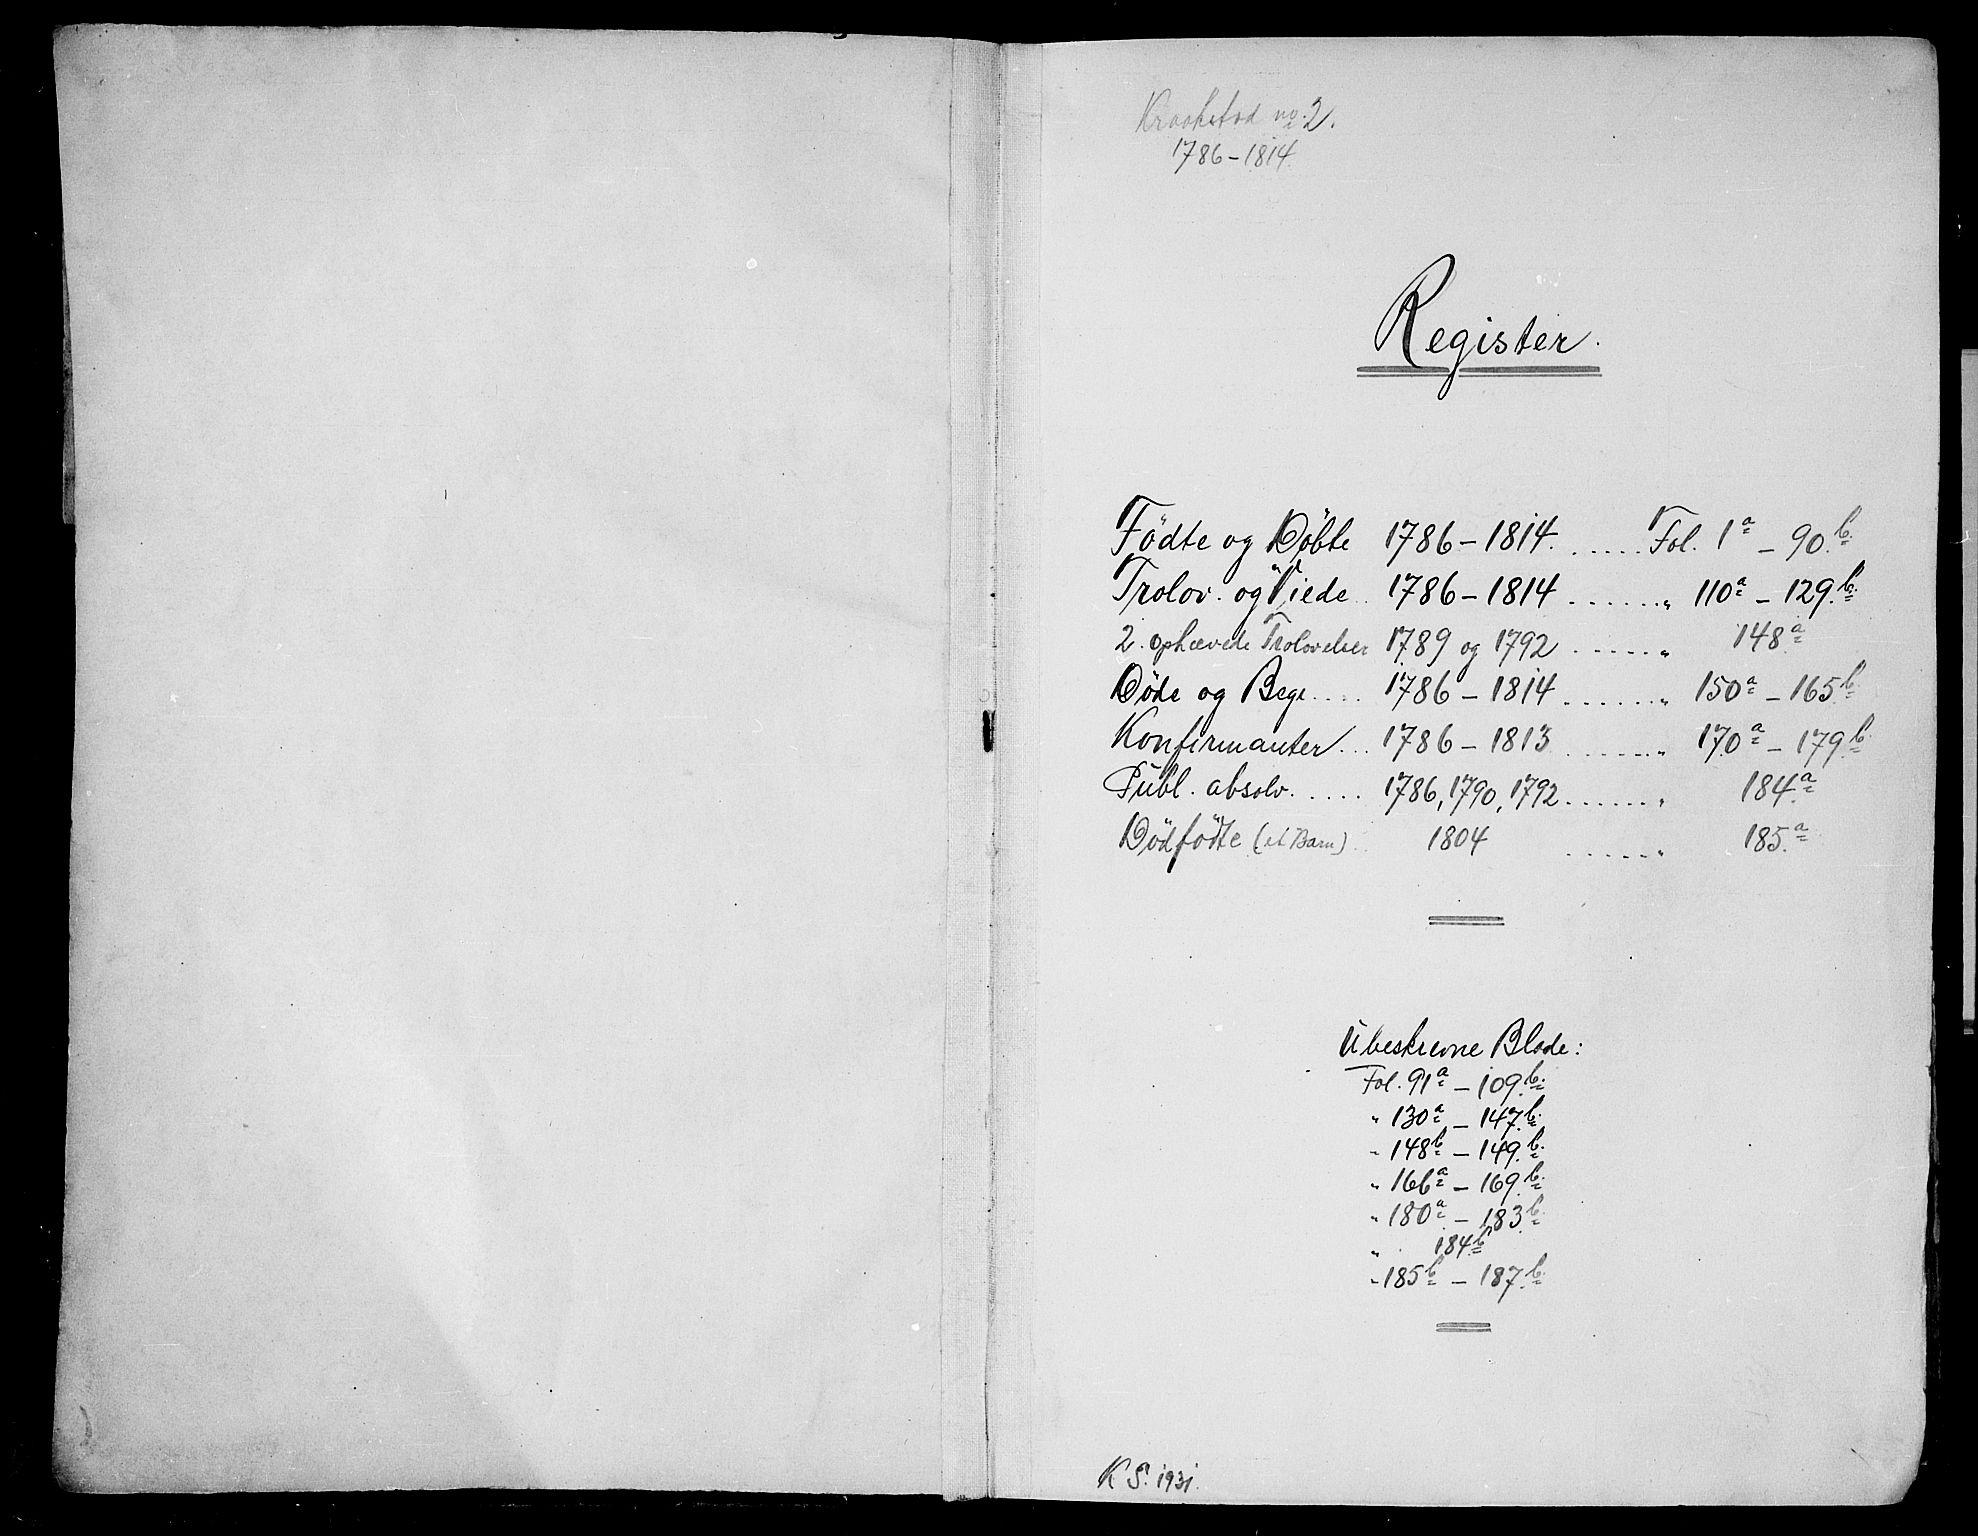 SAO, Kråkstad prestekontor Kirkebøker, F/Fa/L0002: Ministerialbok nr. I 2, 1786-1814